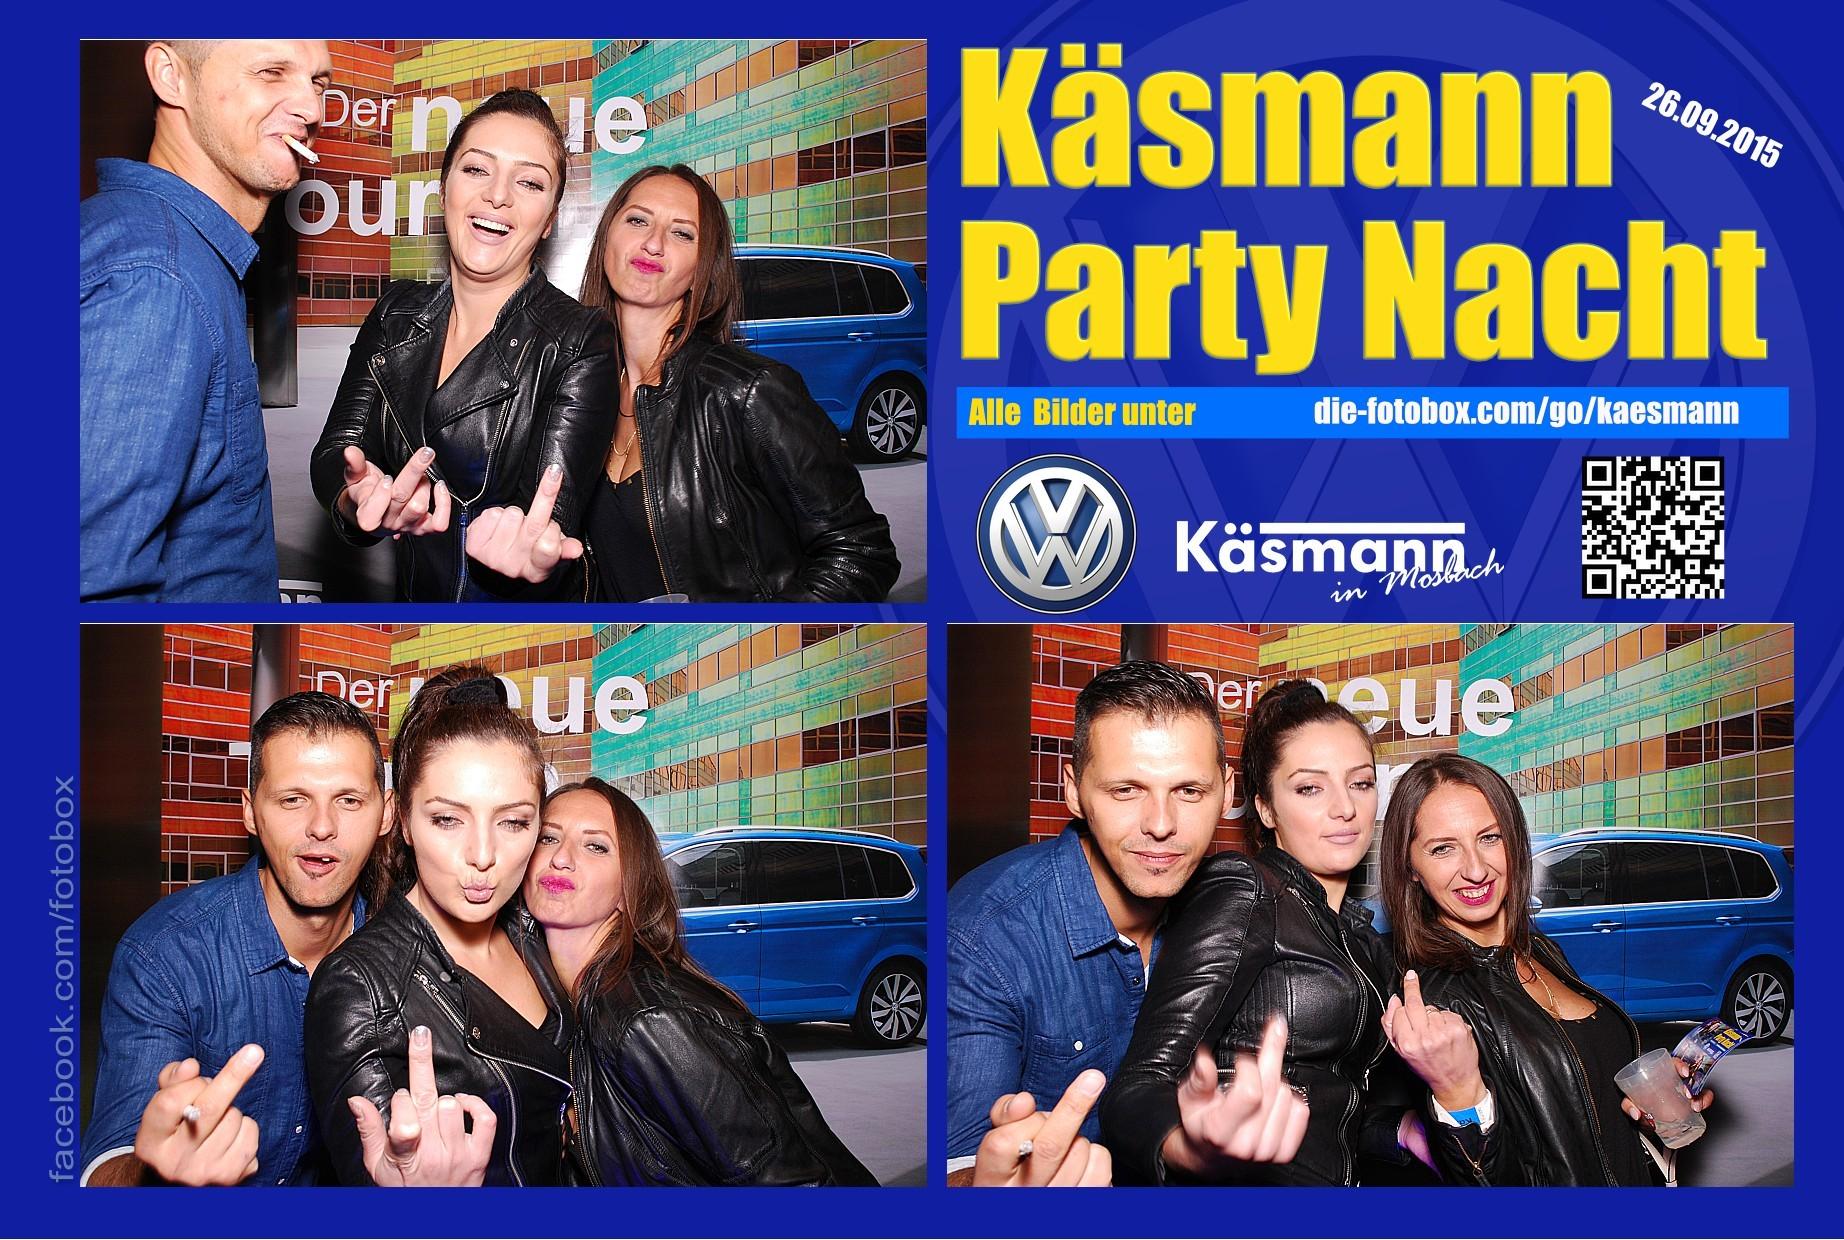 Käsmannparty 2015 - www.die-fotobox.com 01100